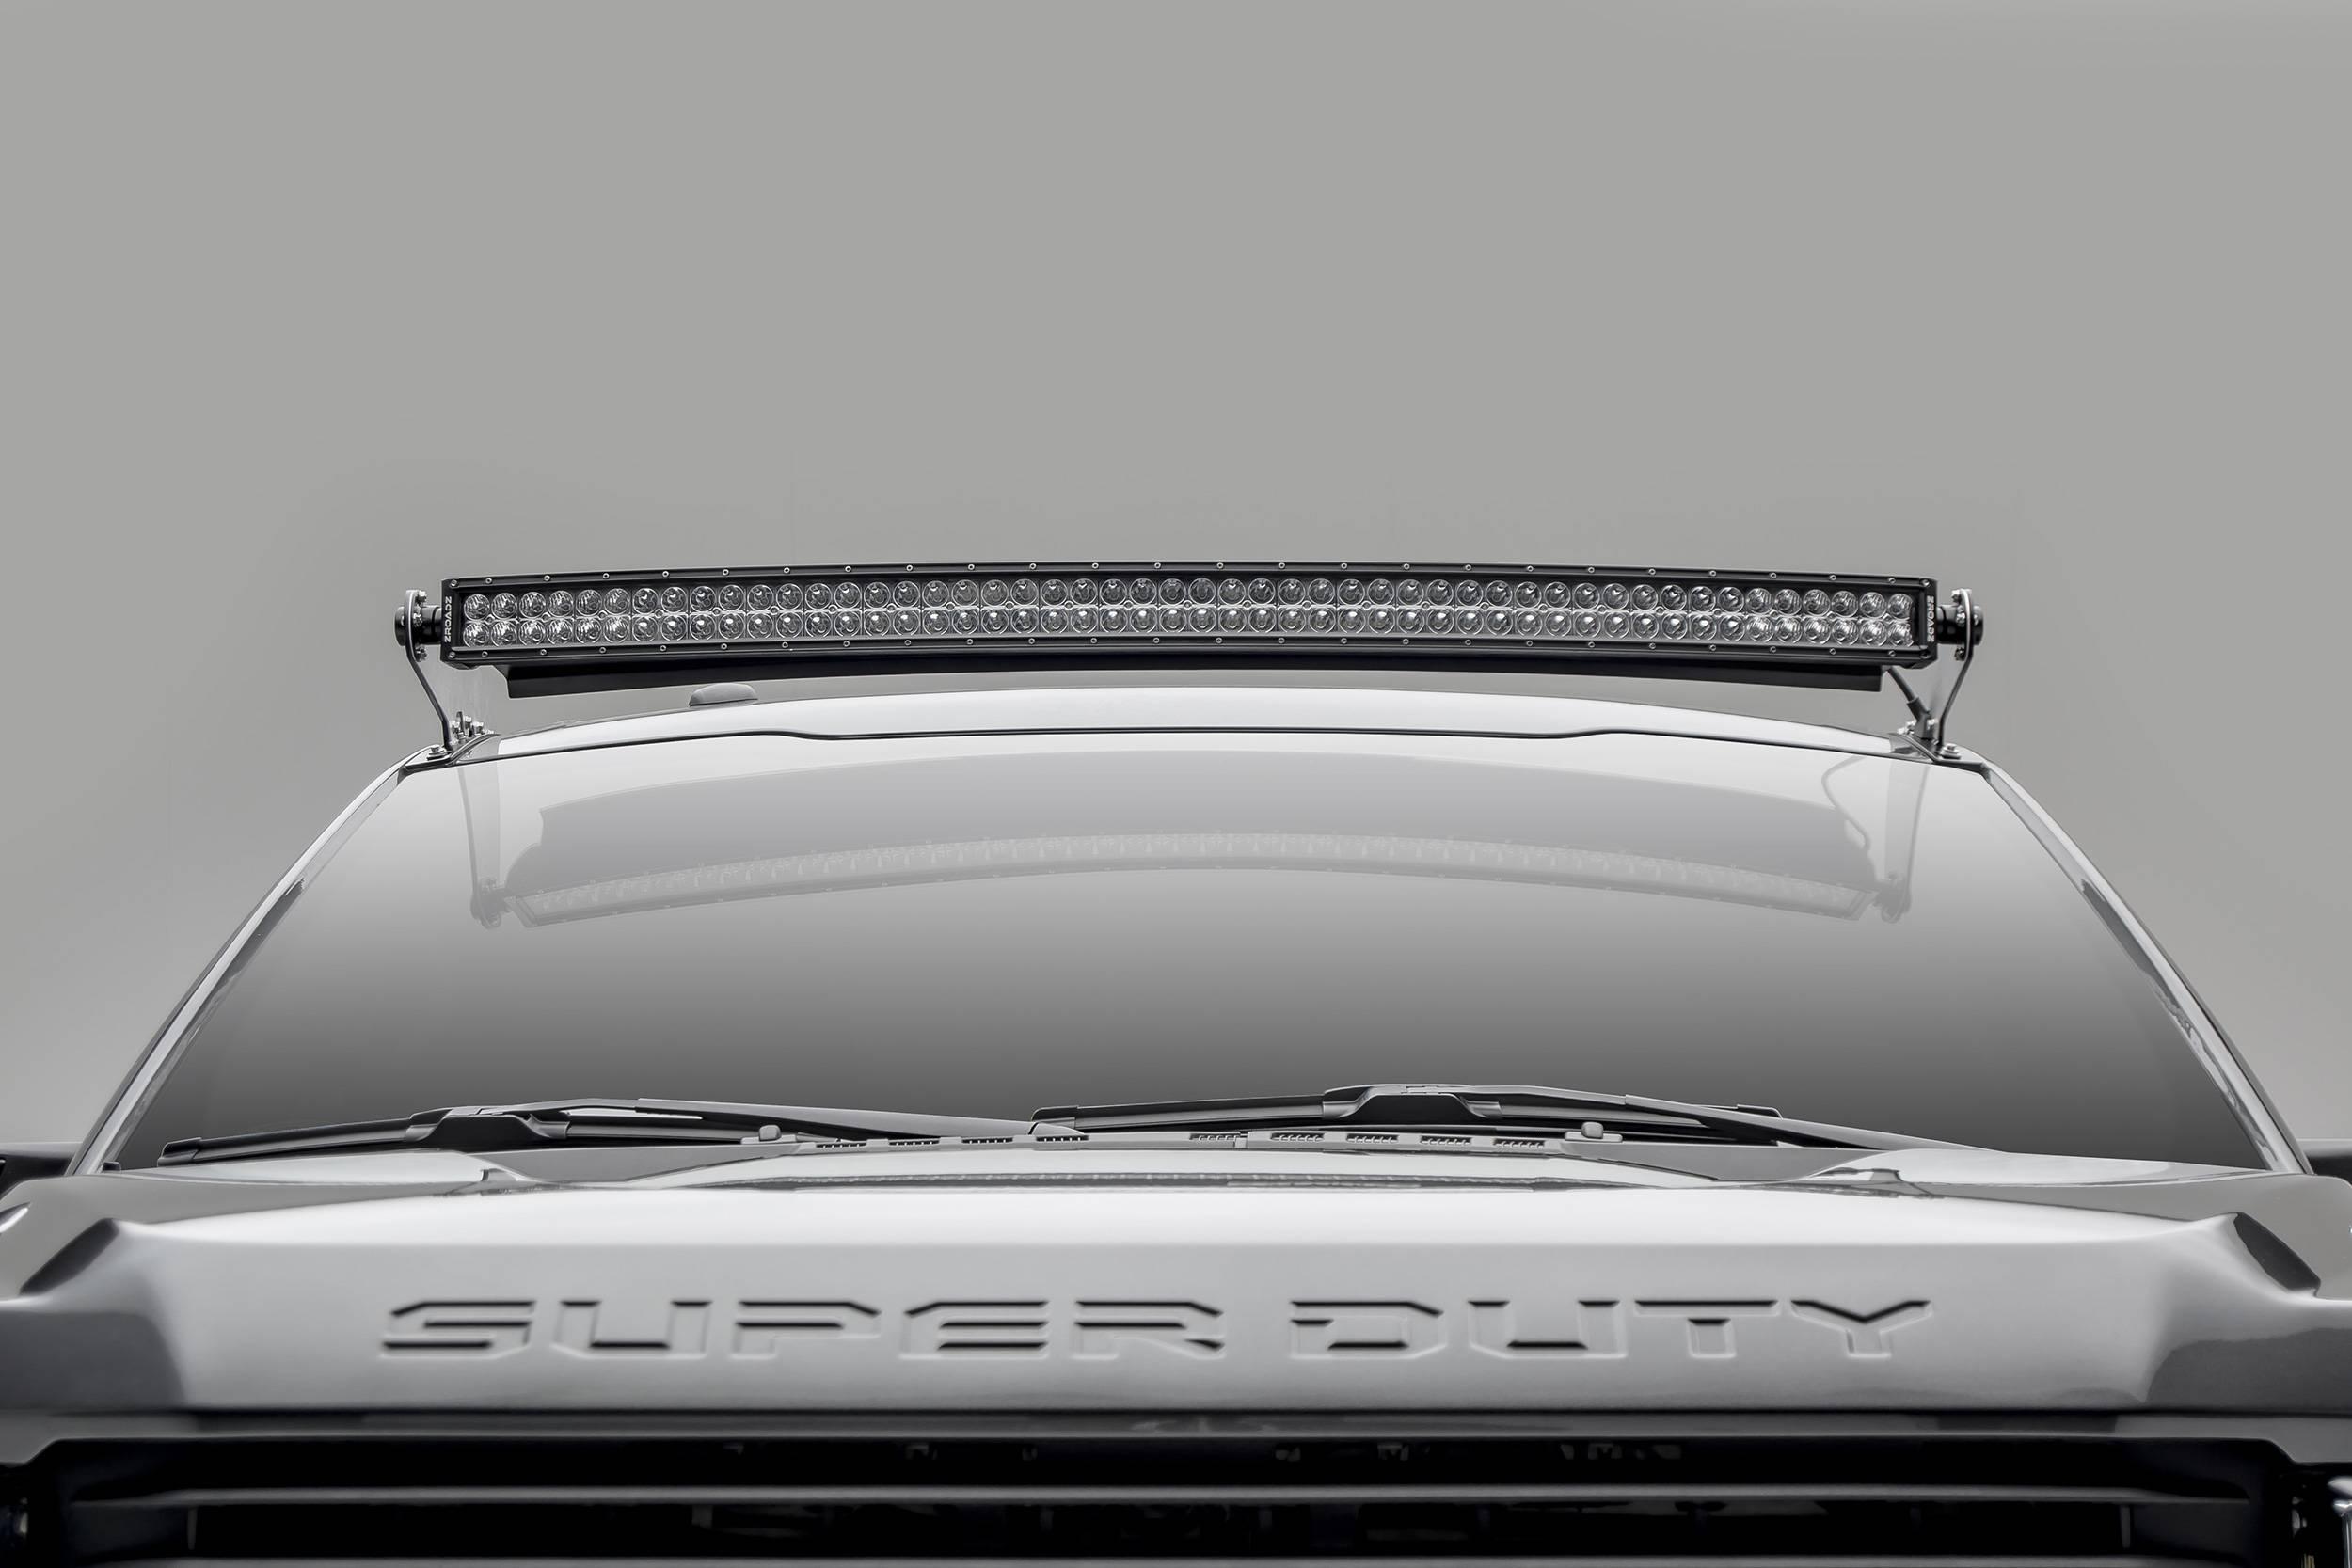 2017 2019 Ford Super Duty Front Roof Led Bracket To Mount 1 52 Inch Curved Led Light Bar Pn Z335471